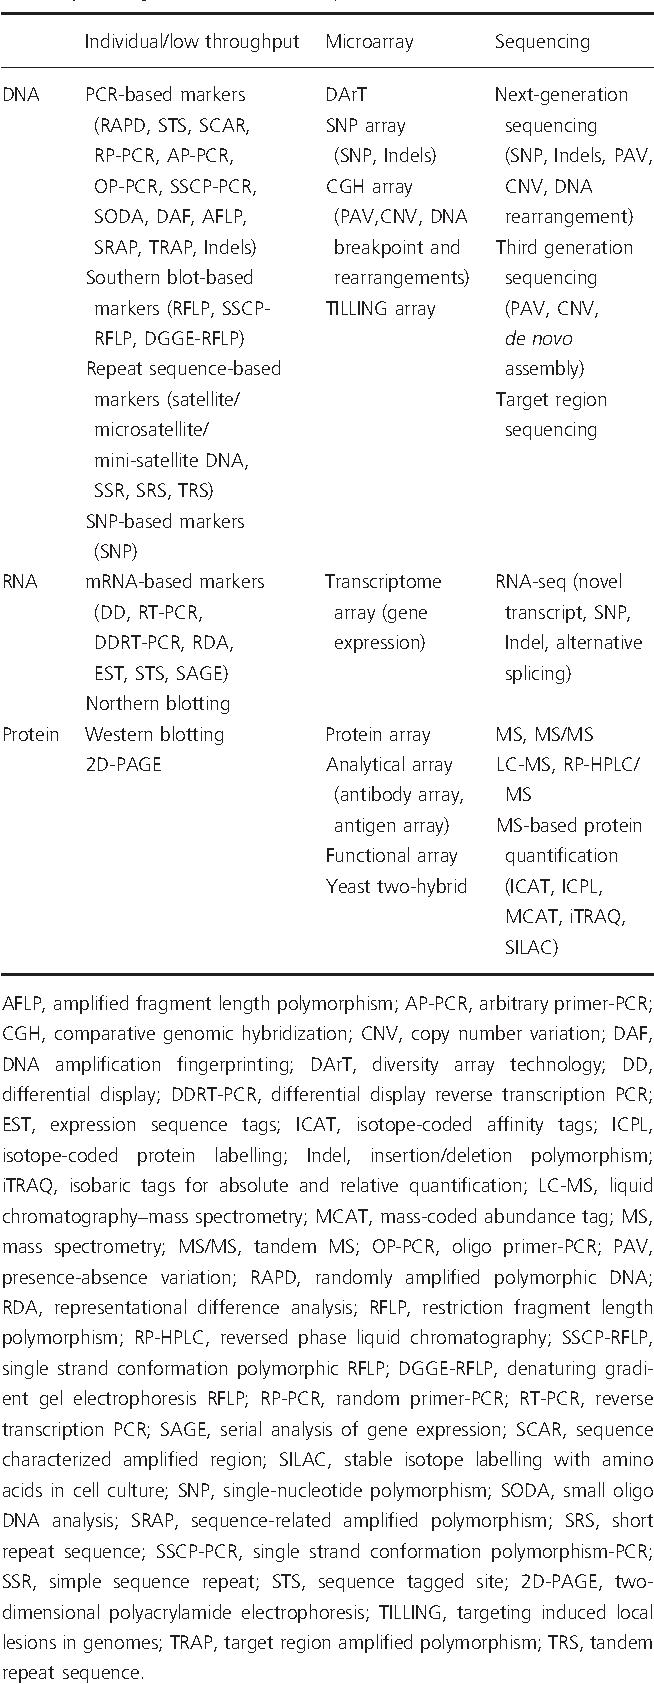 Bulked sample analysis in genetics, genomics and crop